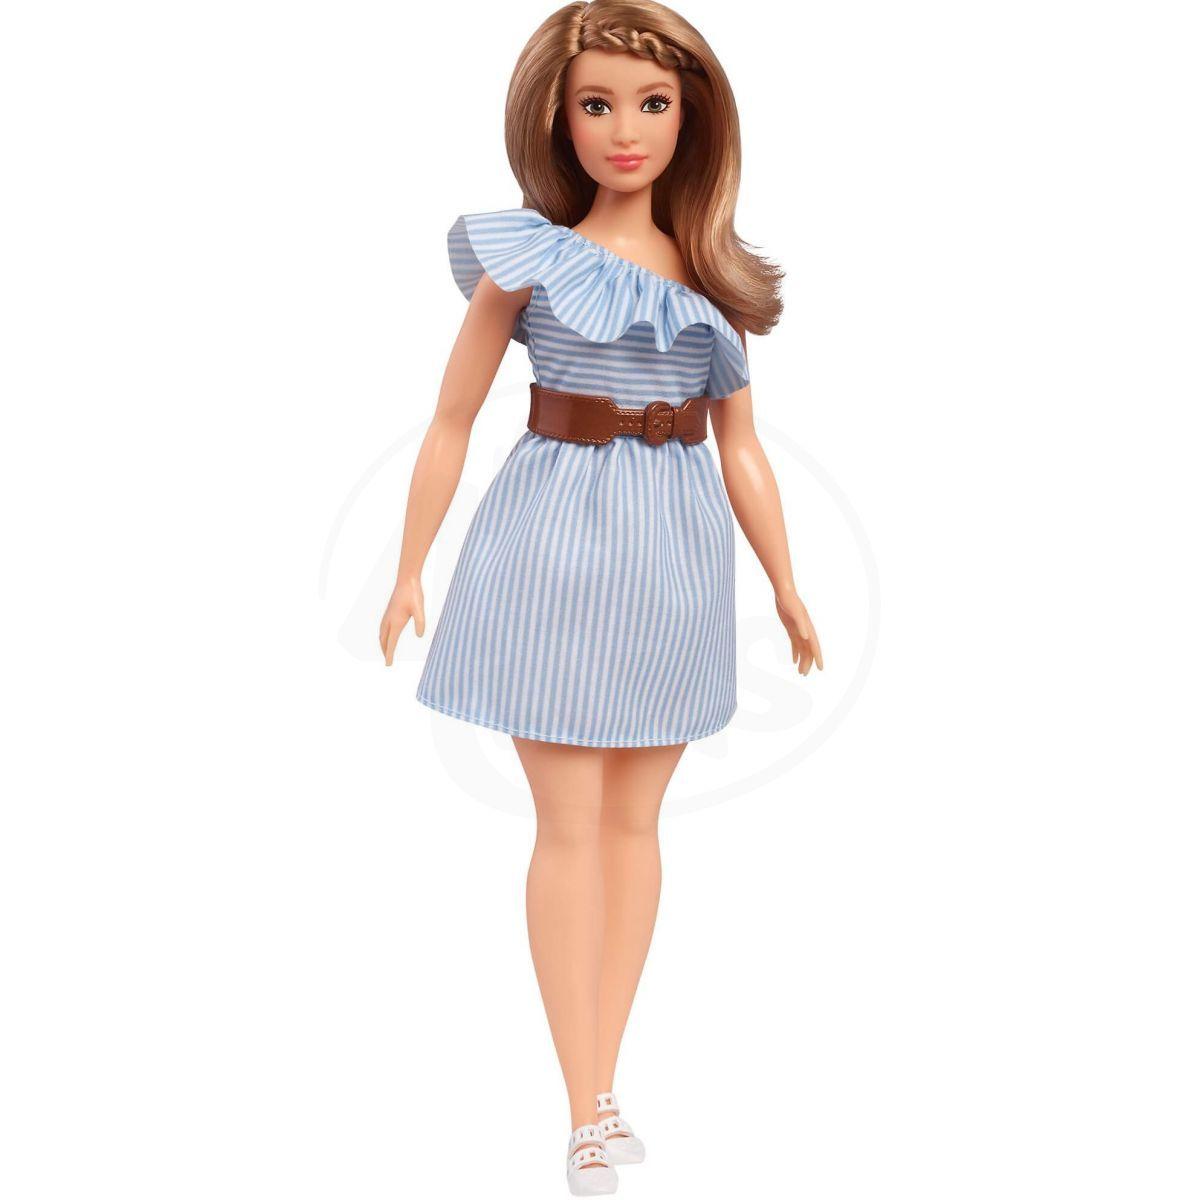 Mattel Barbie modelka 76 d3f9b9ae88